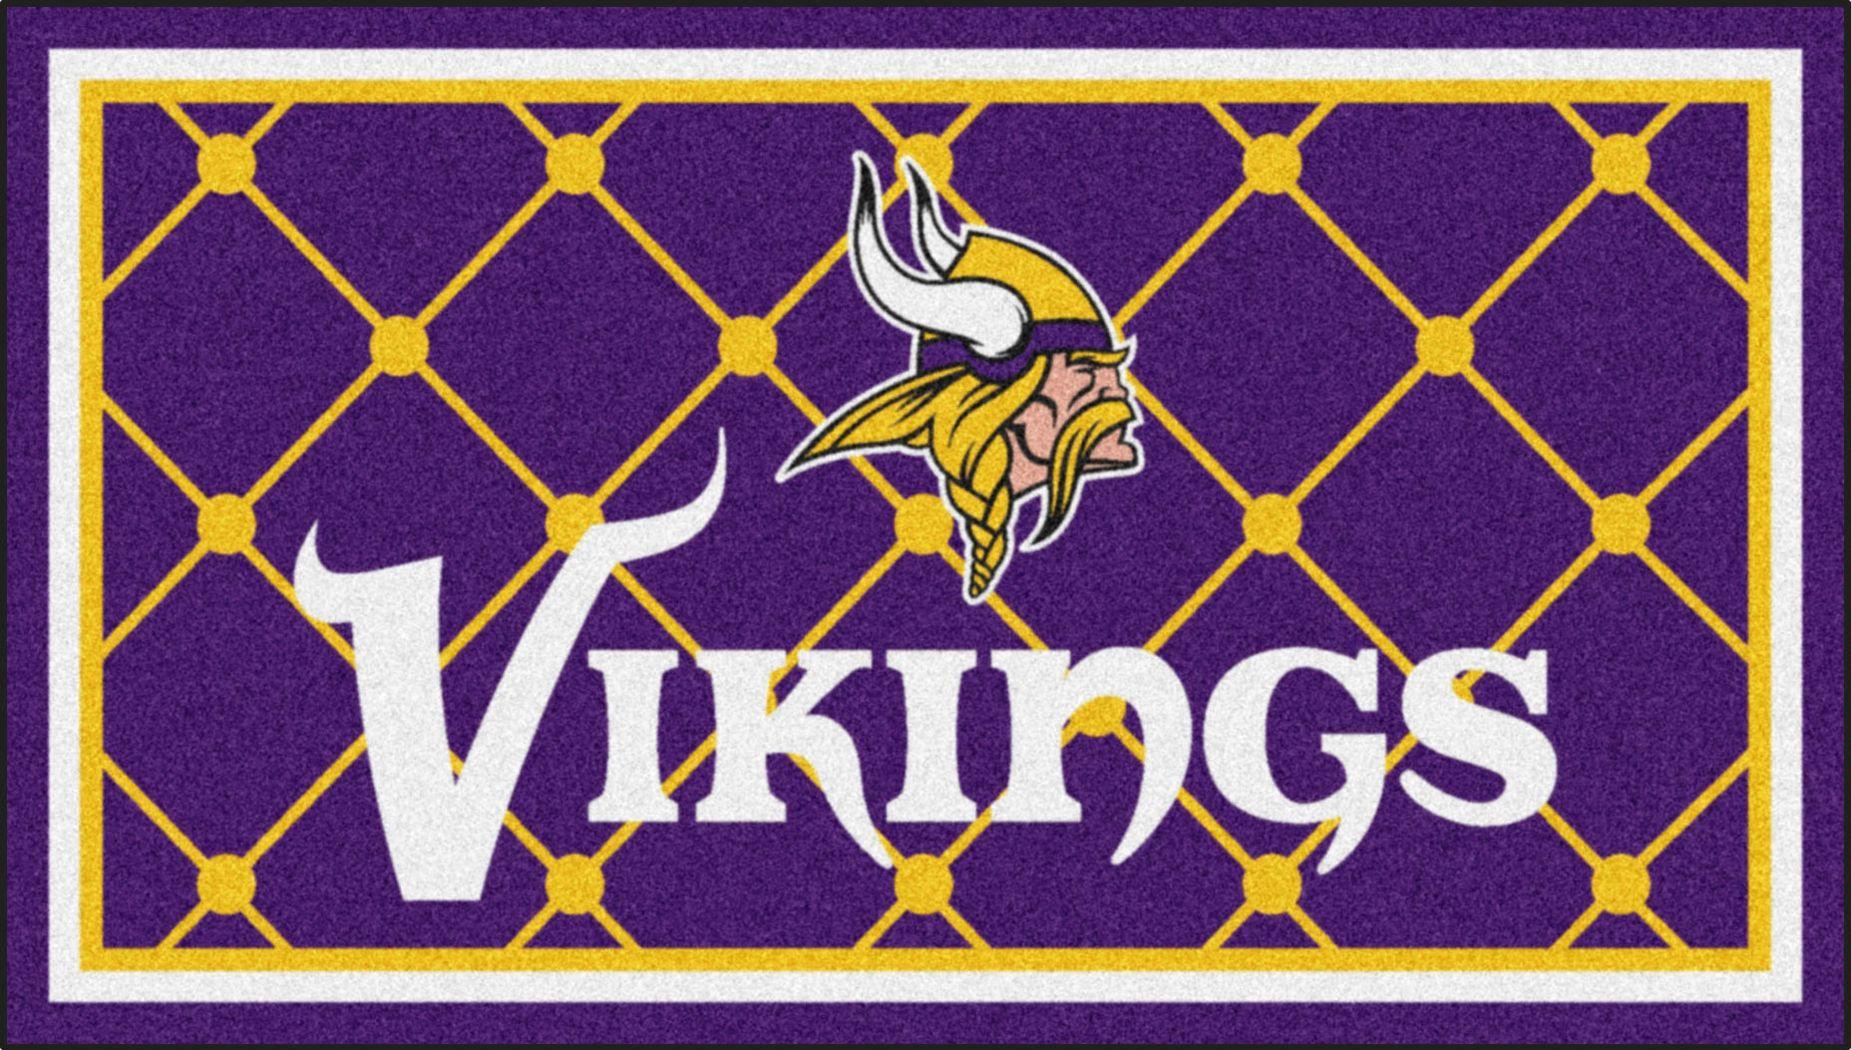 NFL Big Game Minnesota Vikings 3' x 5' Rug